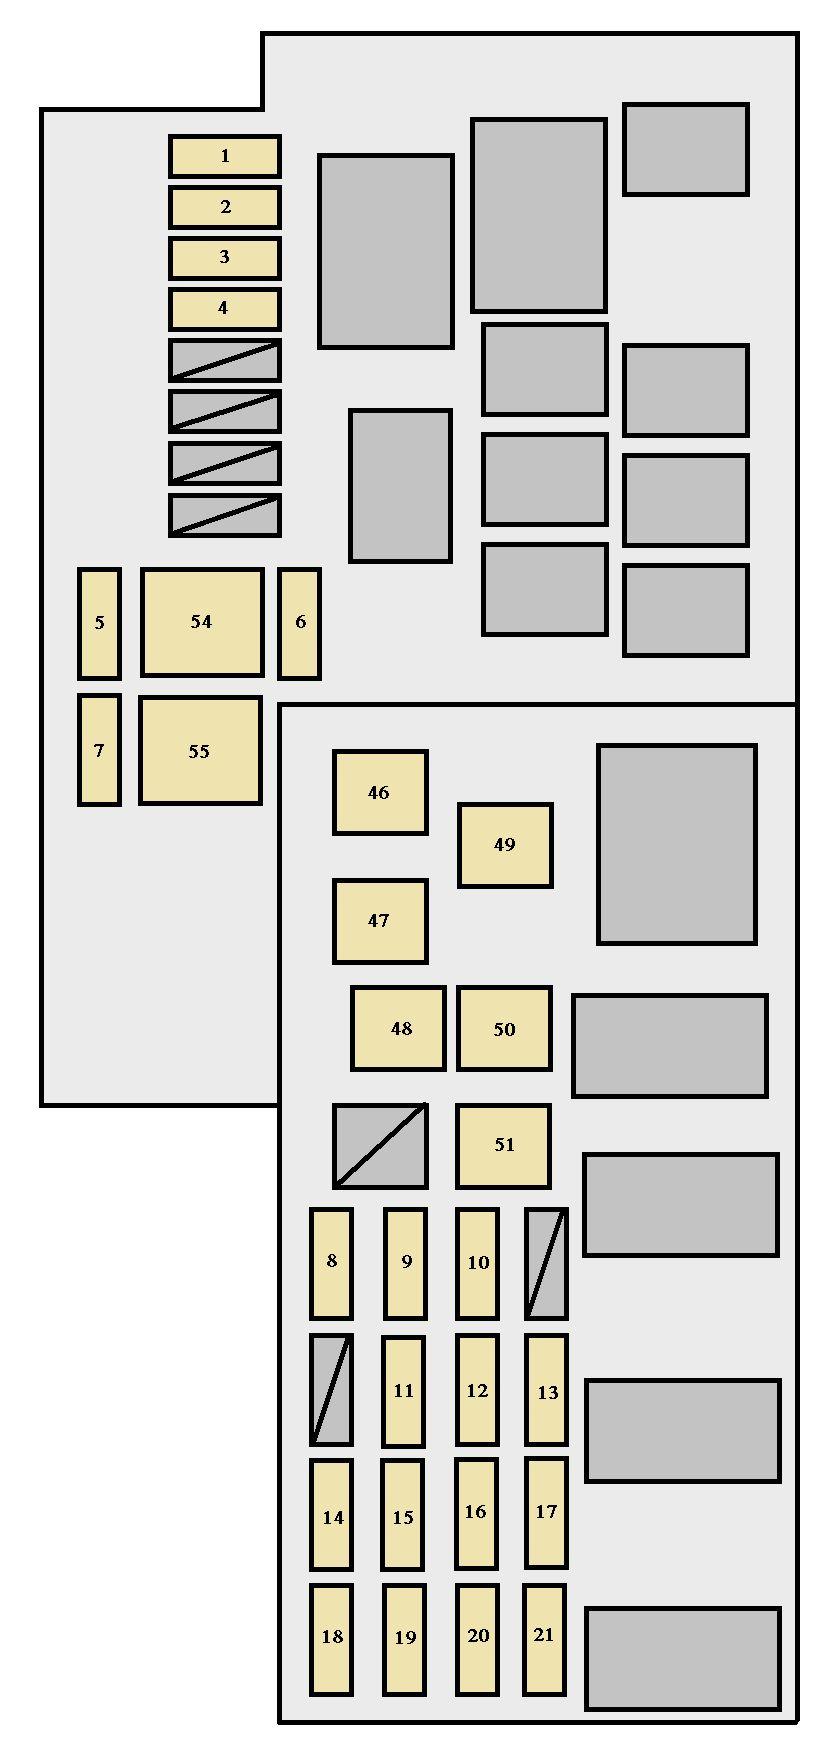 [CSDW_4250]   KN_2953] Toyota Solara Fuse Box Diagram | 1999 Oldsmobile Silhouette Fuse Box Diagram |  | Diog Ginou Pelap Elec Mohammedshrine Librar Wiring 101